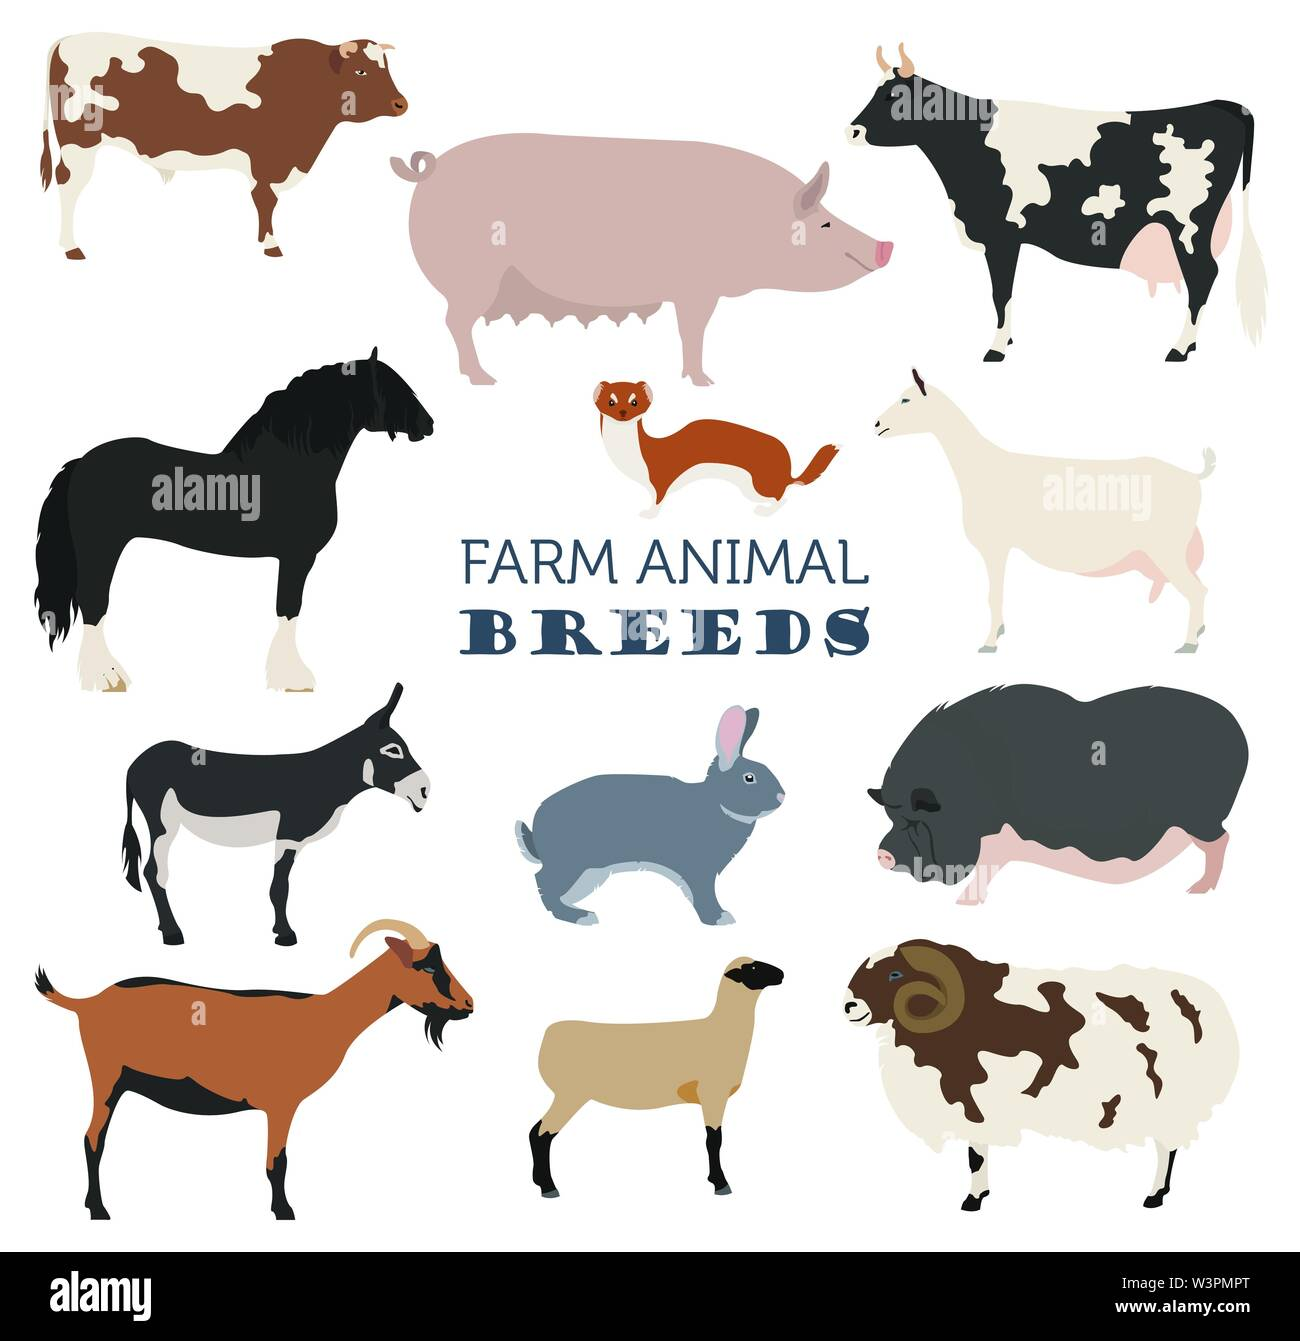 Animal farming, livestock. Cattle, pig, goat, ship, horse, donkey, rabbit, fur  icon set isolated on white. Flat design. Vector illustration Stock Vector